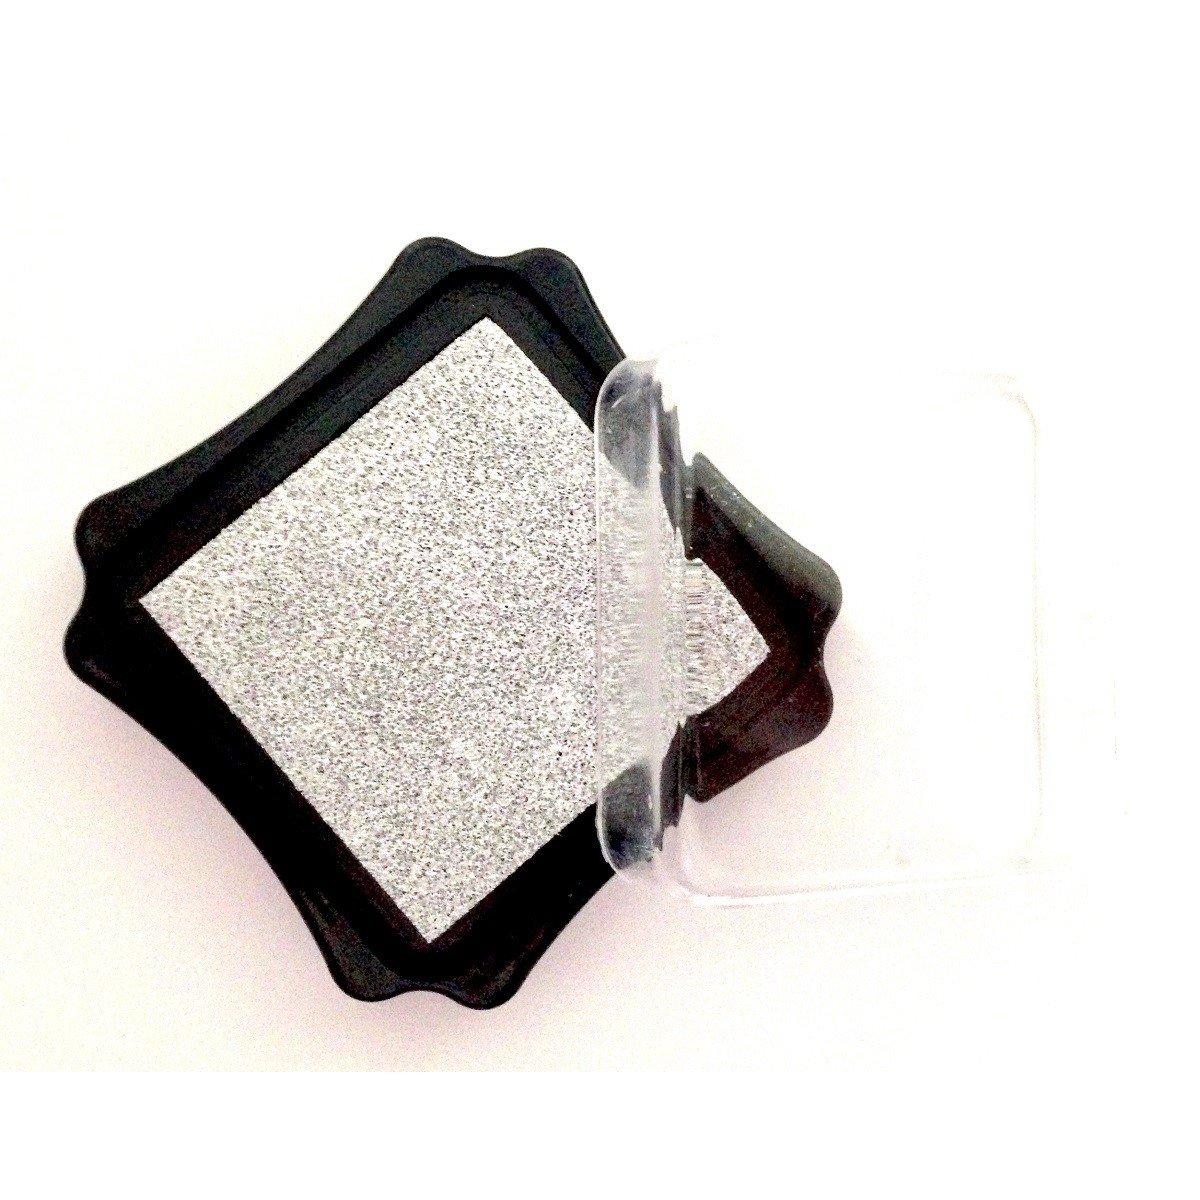 Wax Sealing INK PAD in Silver XWS041 GTR-Gifts